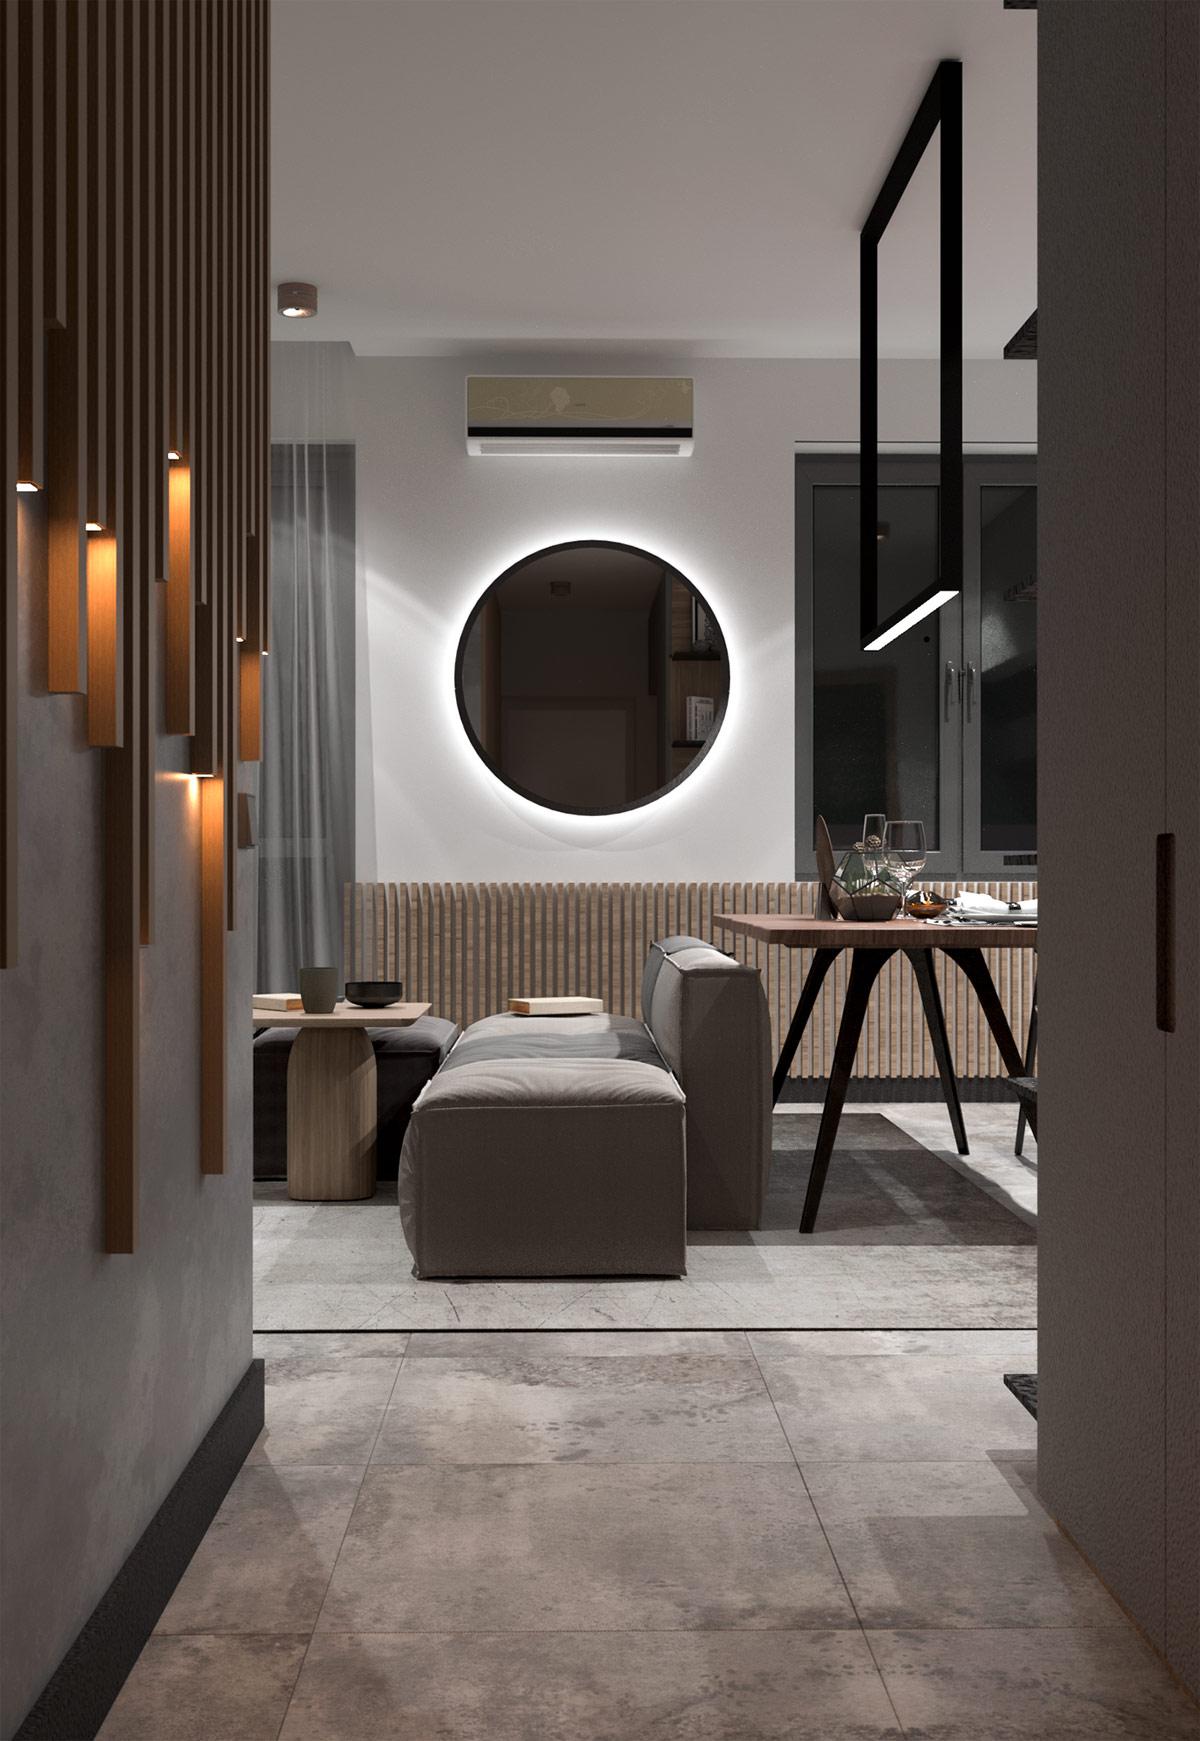 decorative-wall-mirror-1